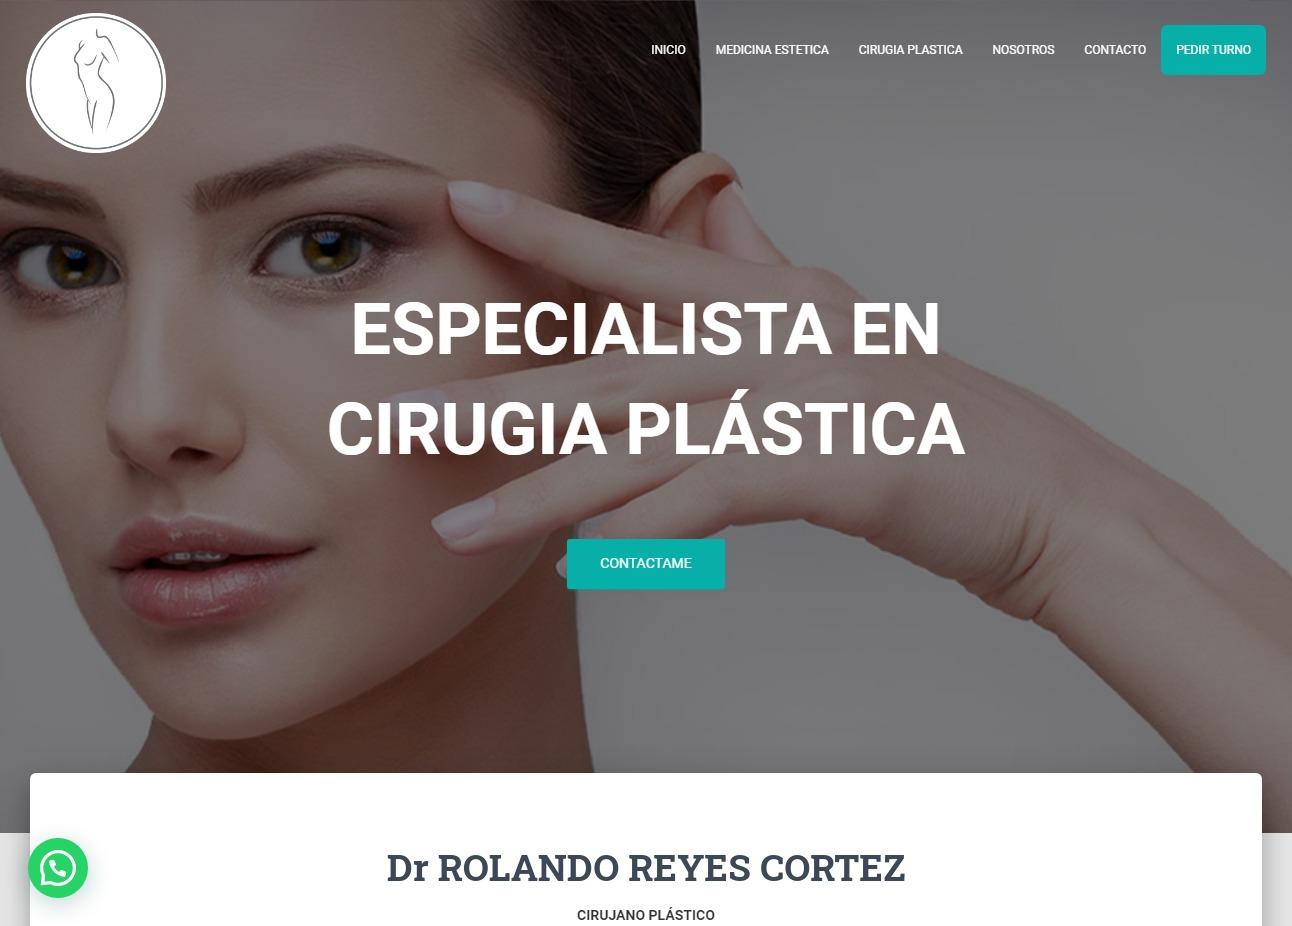 Doctor Reyes Cortez